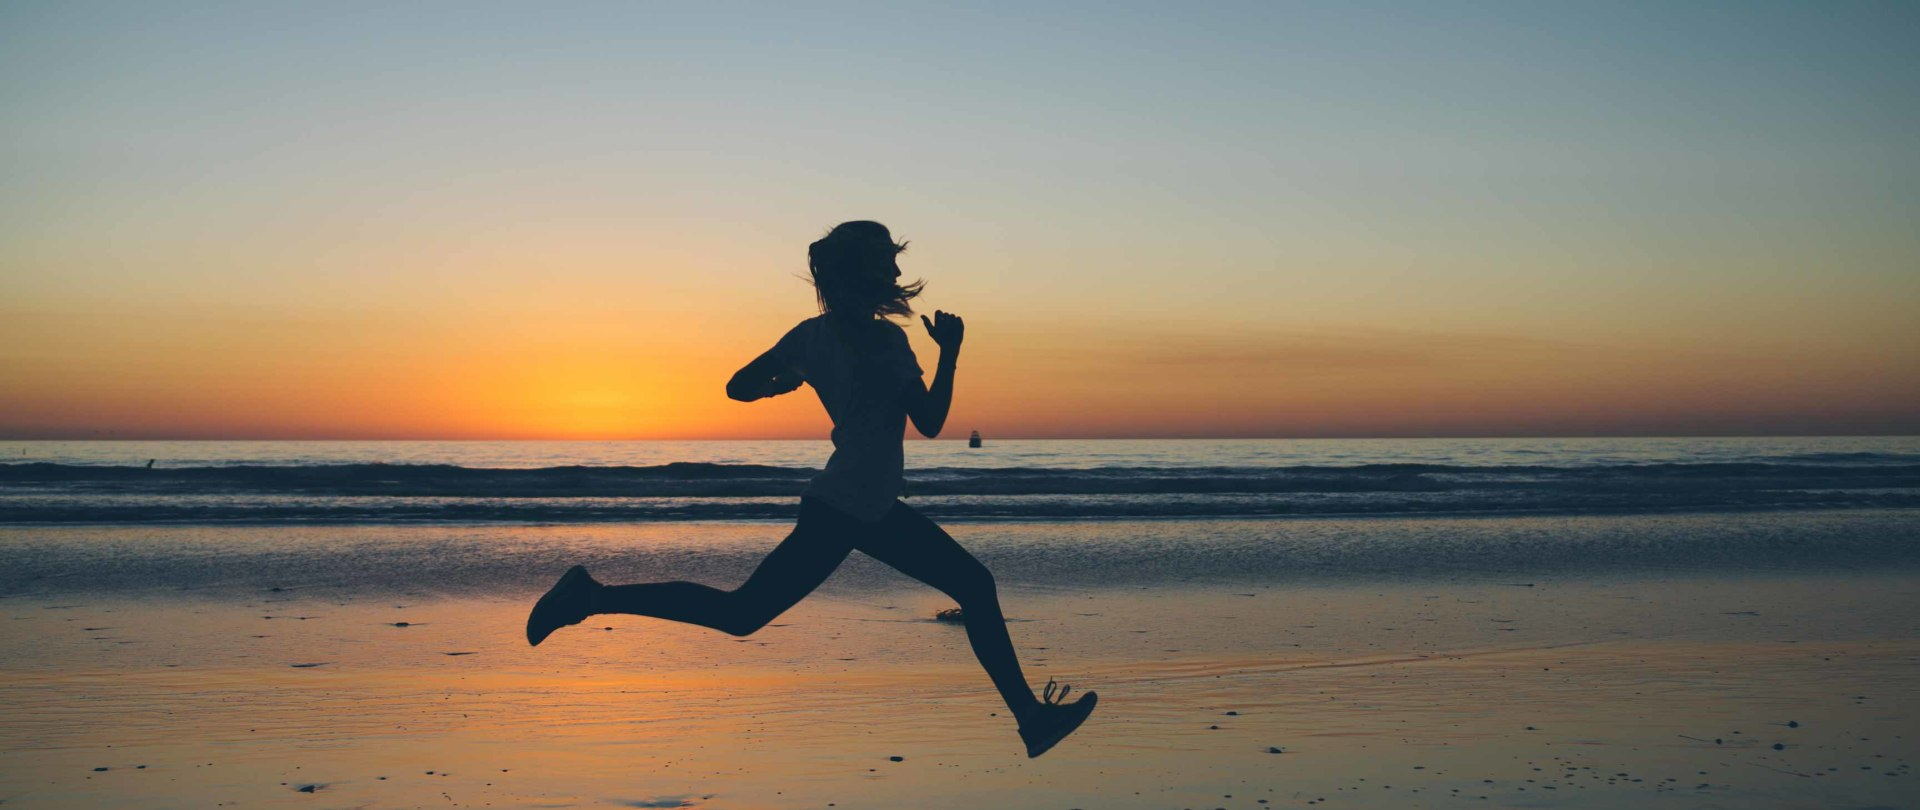 Running on the beach with Energi & AppleWatch Rocksauce Studios